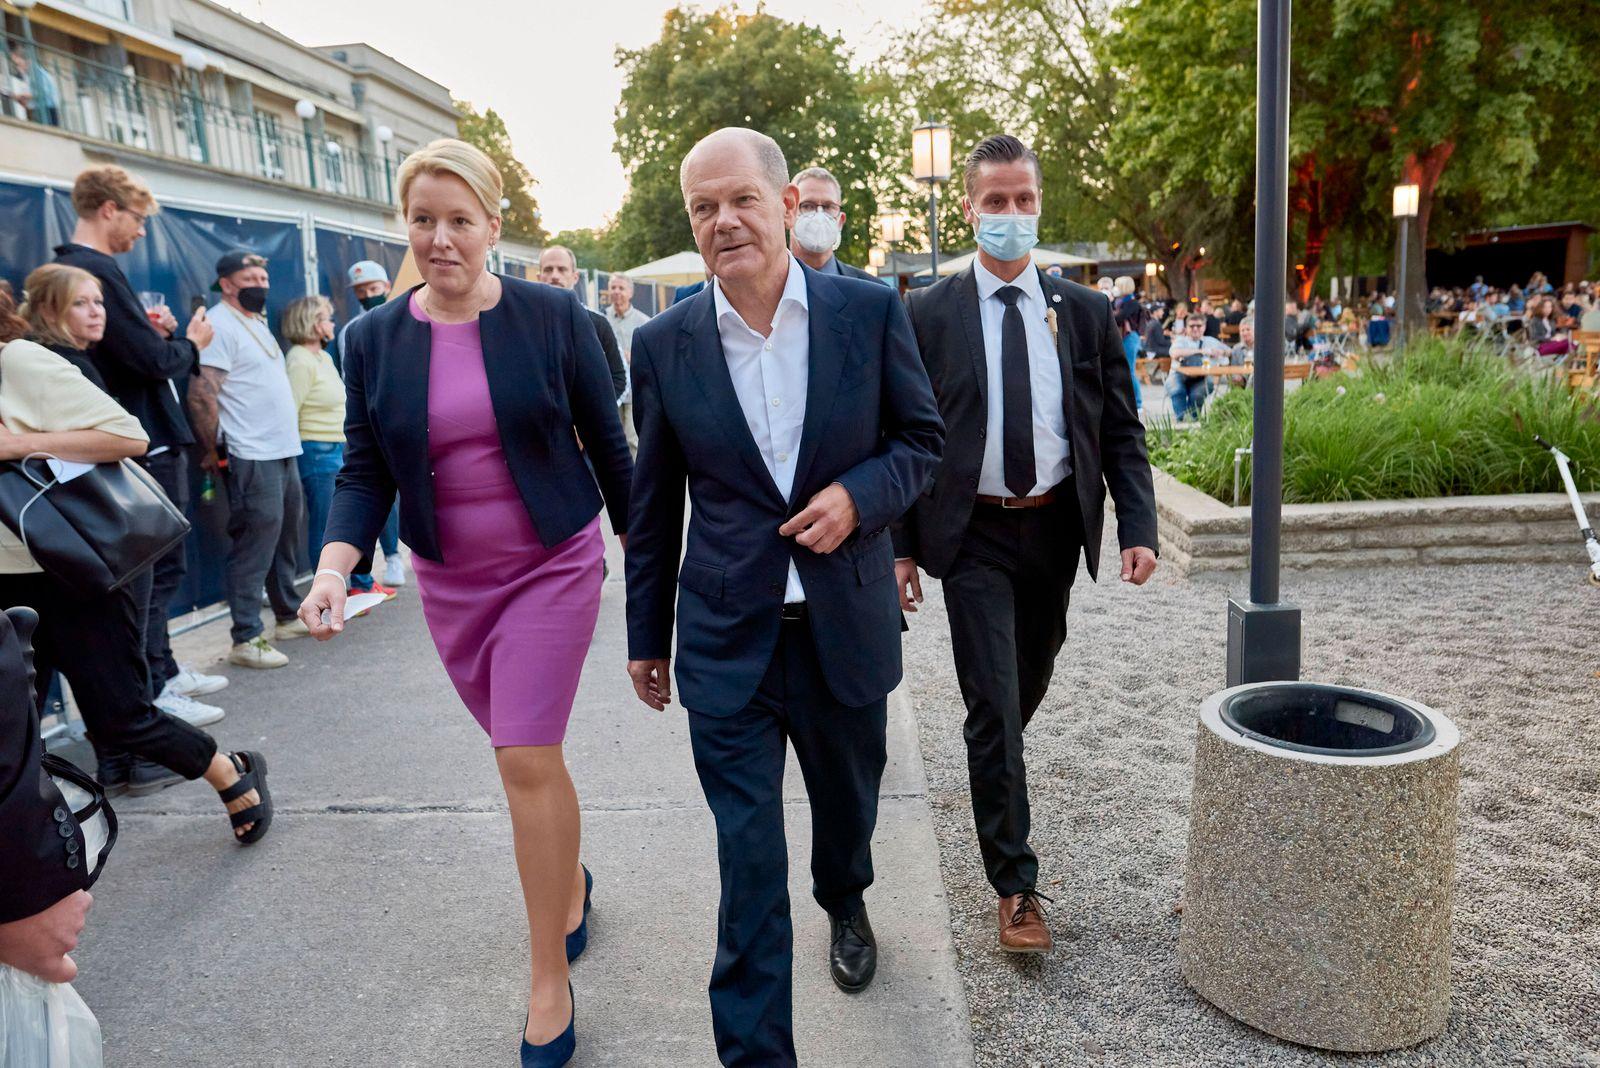 Olaf Scholz + Franziska Giffey Deutschland, Berlin: SPD-Kanzlerkandidat Olaf Scholz auf Wahlkampftour in Berlin Treptow